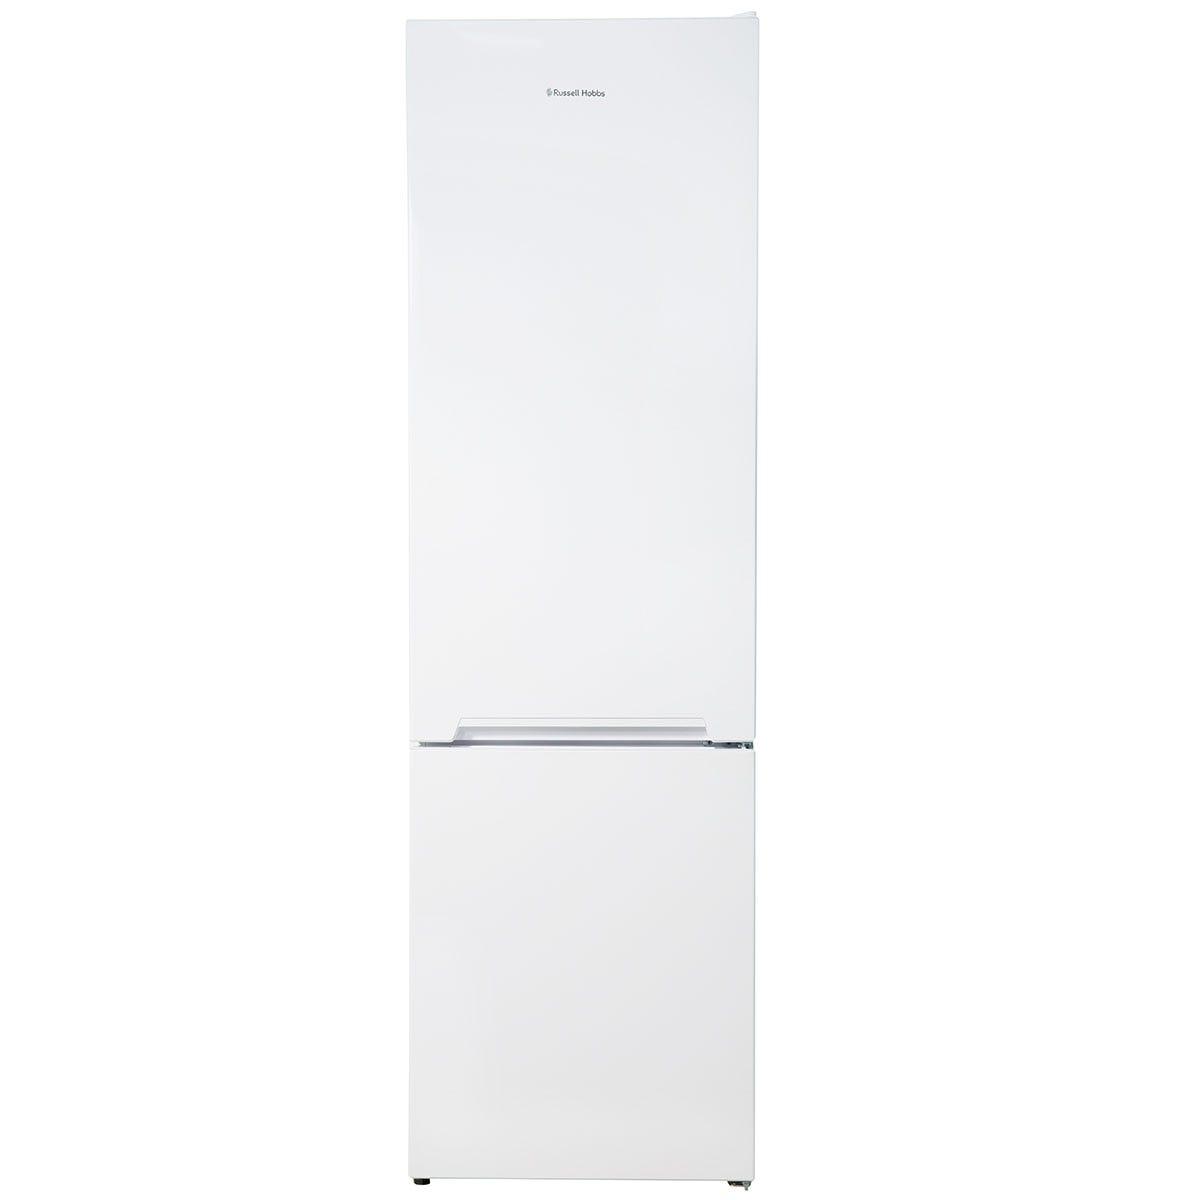 Russell Hobbs RH180FFFF55 279L 70/30 Frost Free Fridge Freezer - White